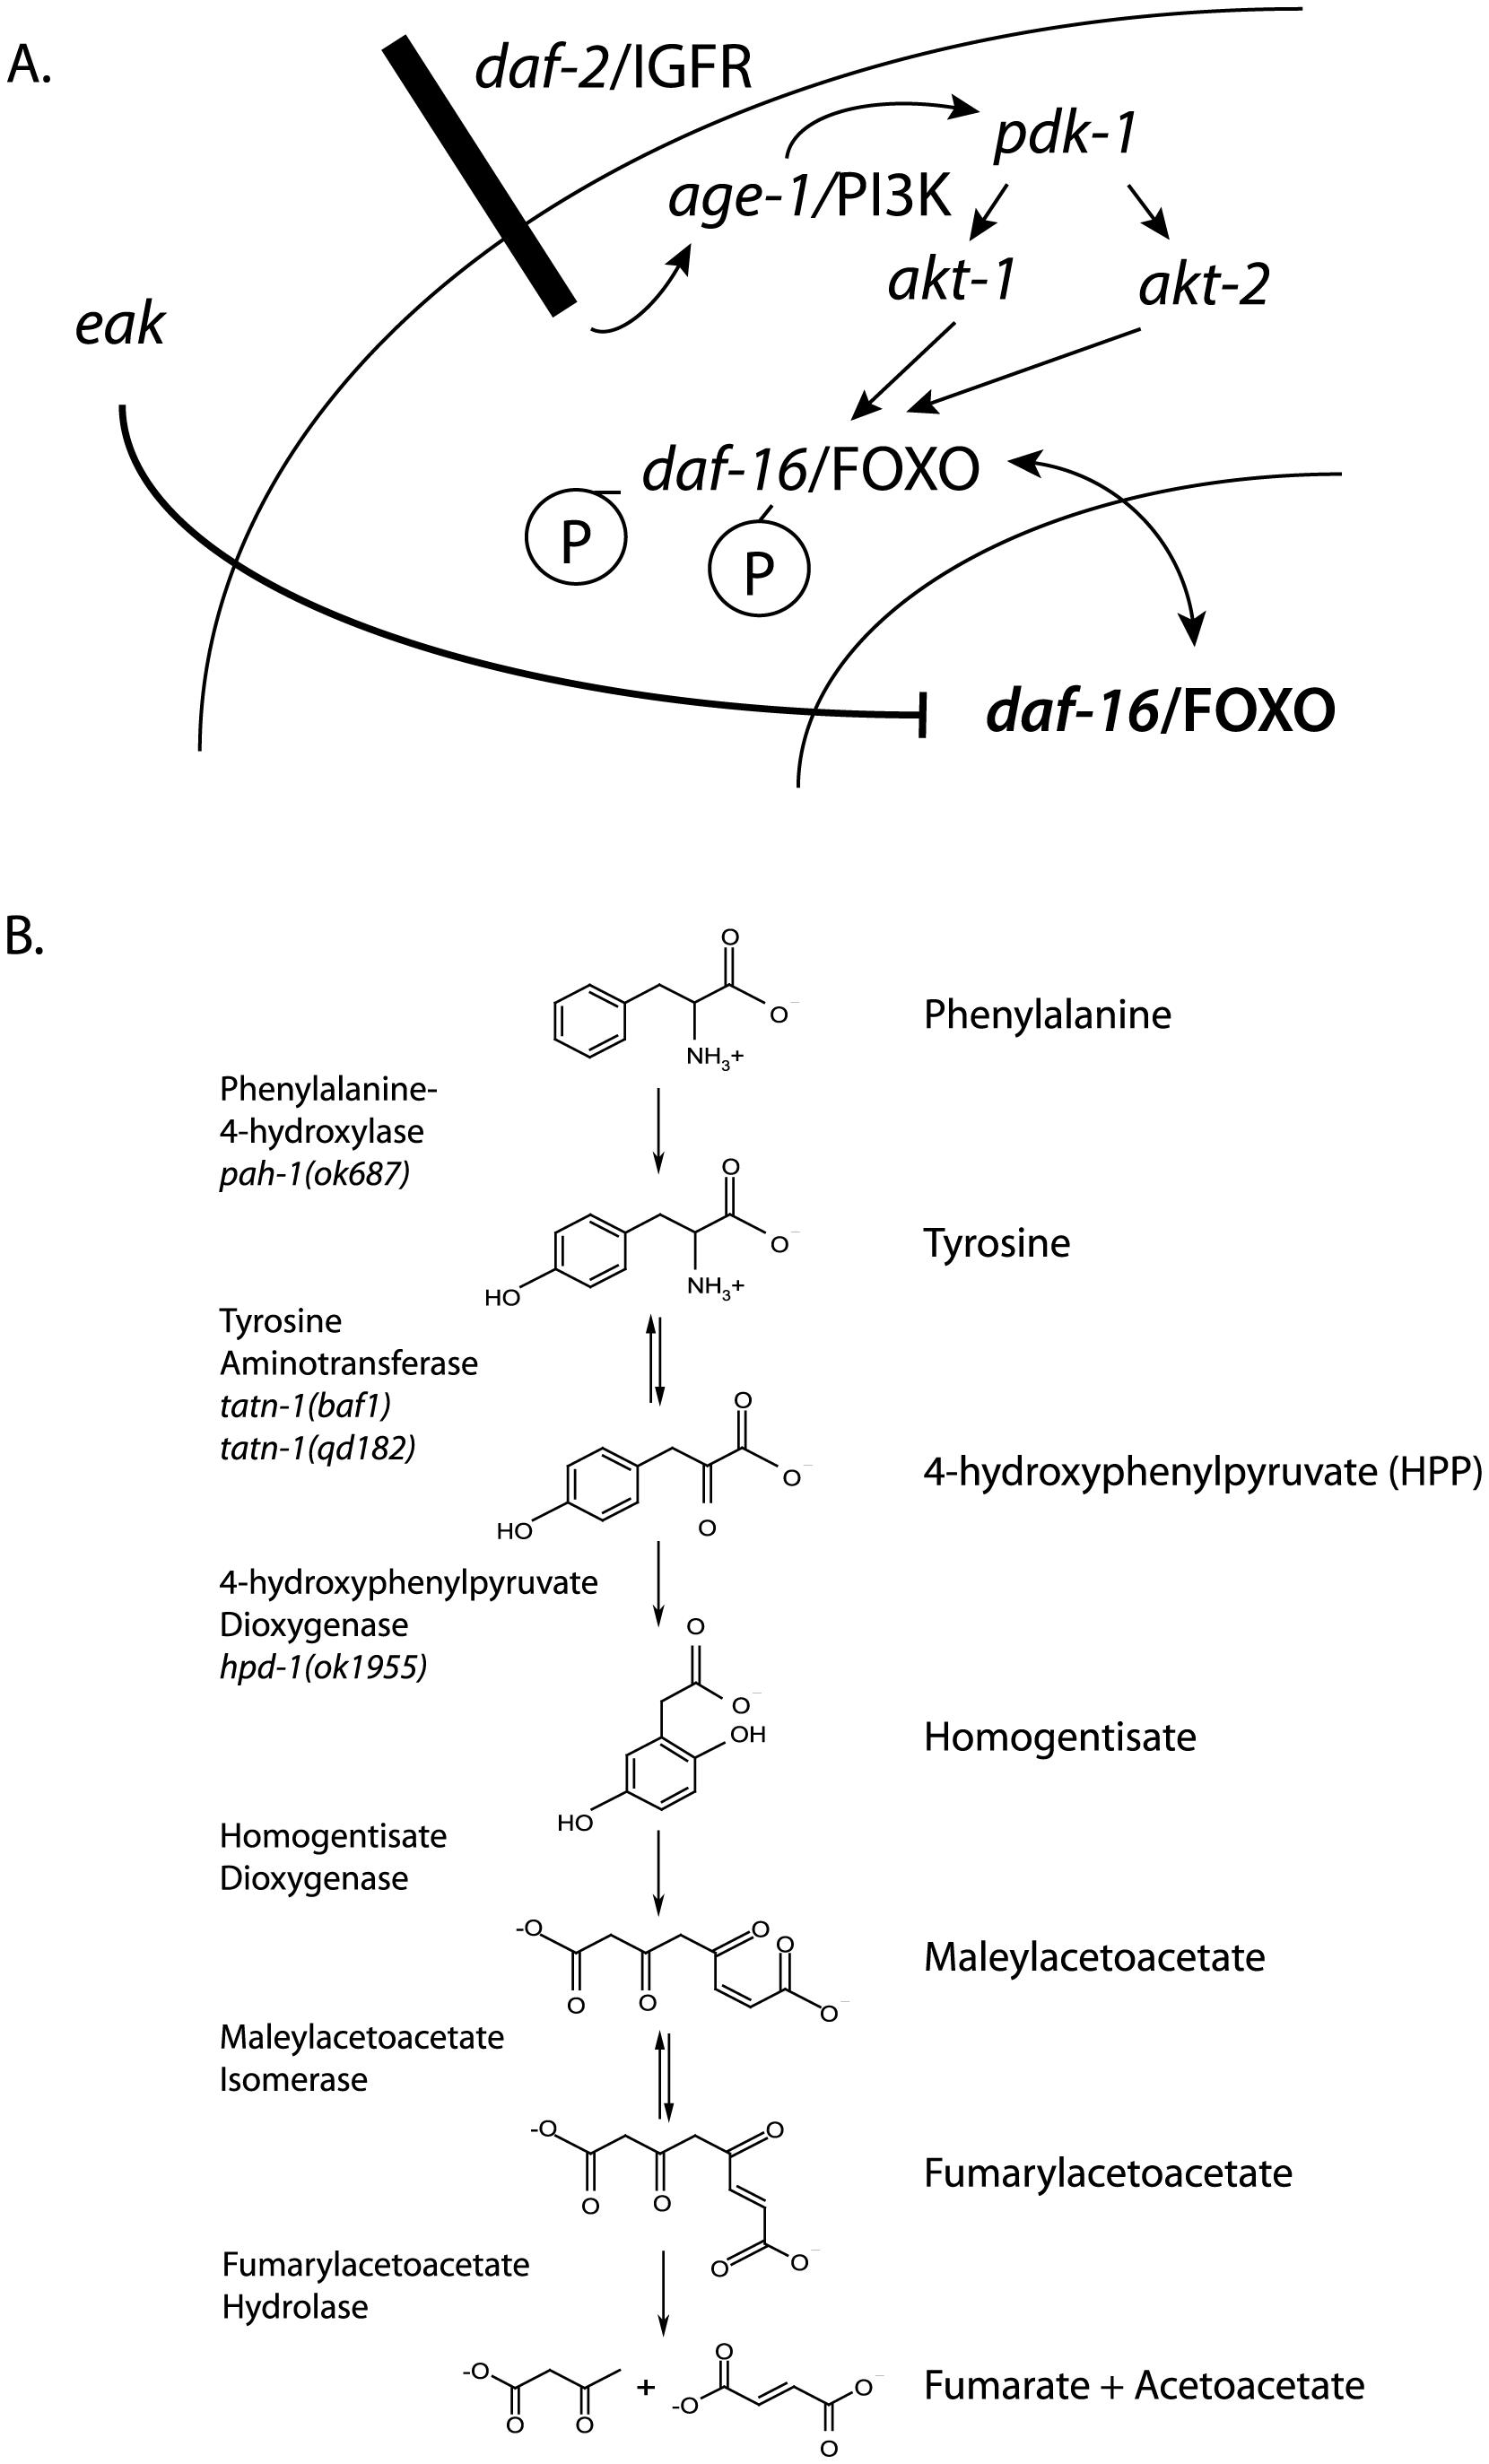 Diagram of <i>daf-2</i>/IGFR signaling pathway and tyrosine metabolic pathway.